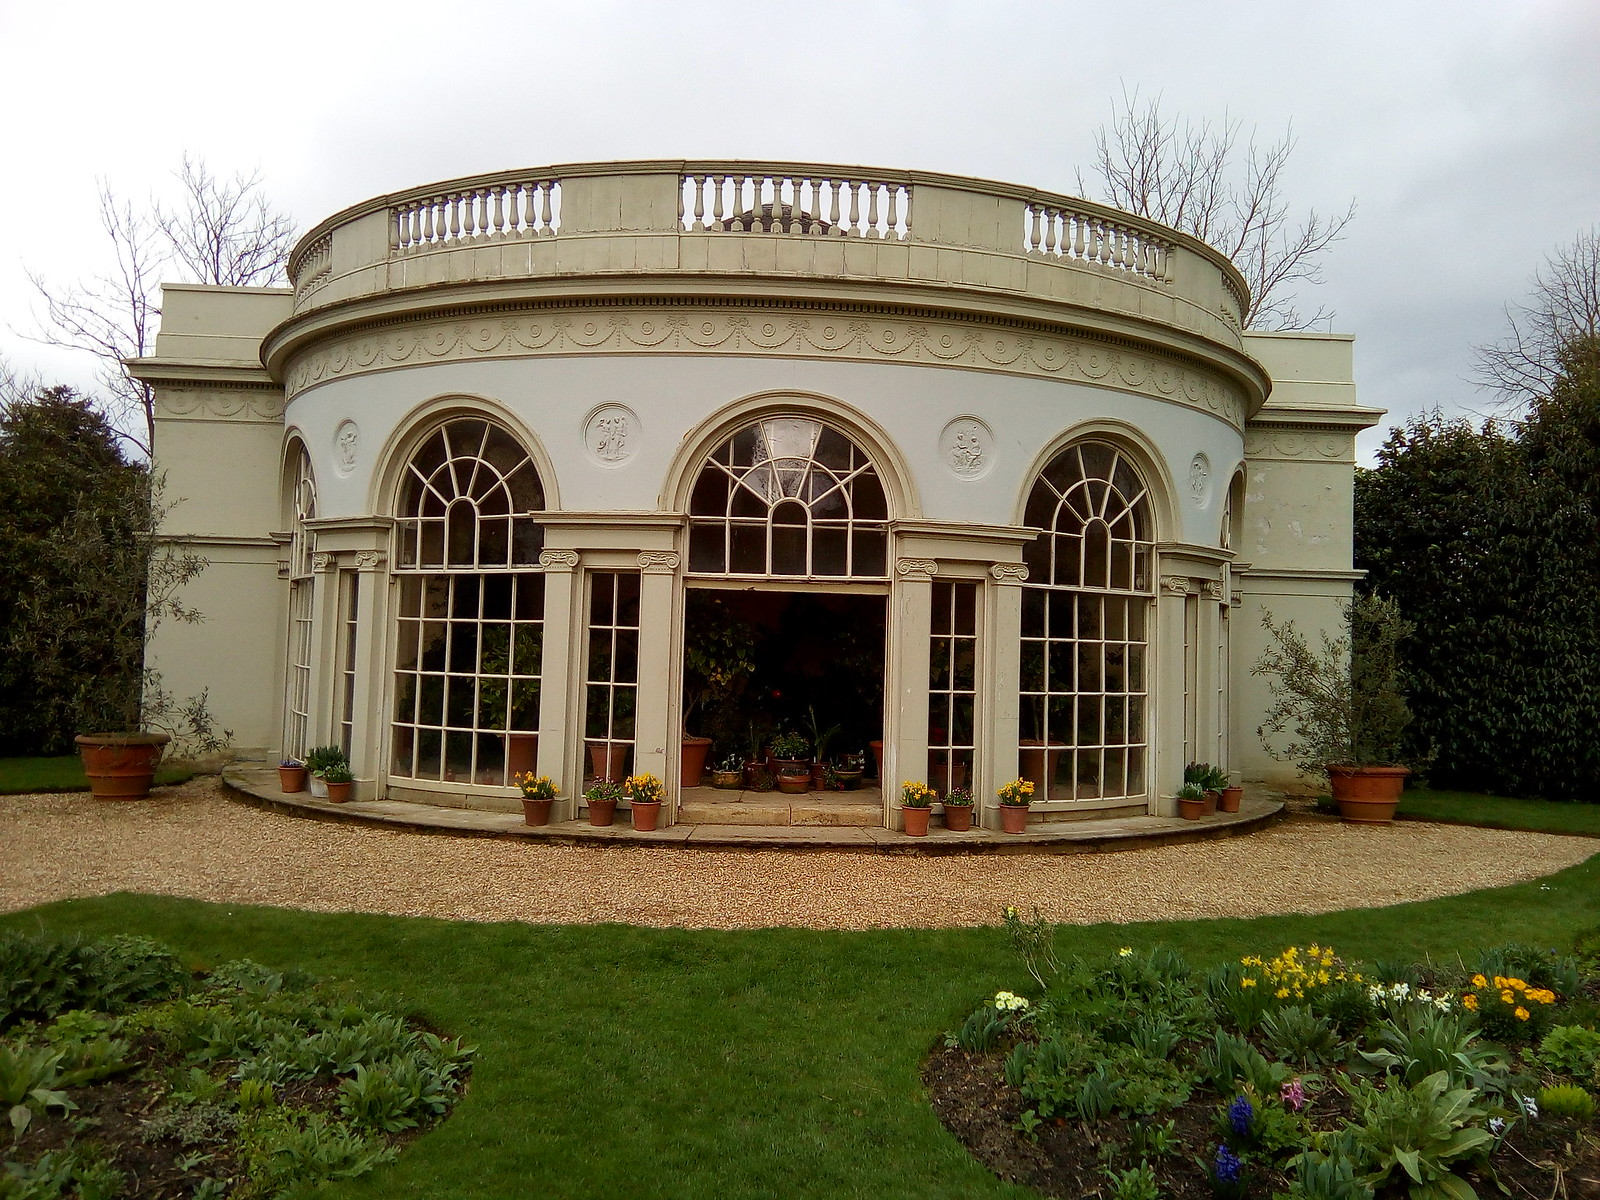 Osterley Park Garden house